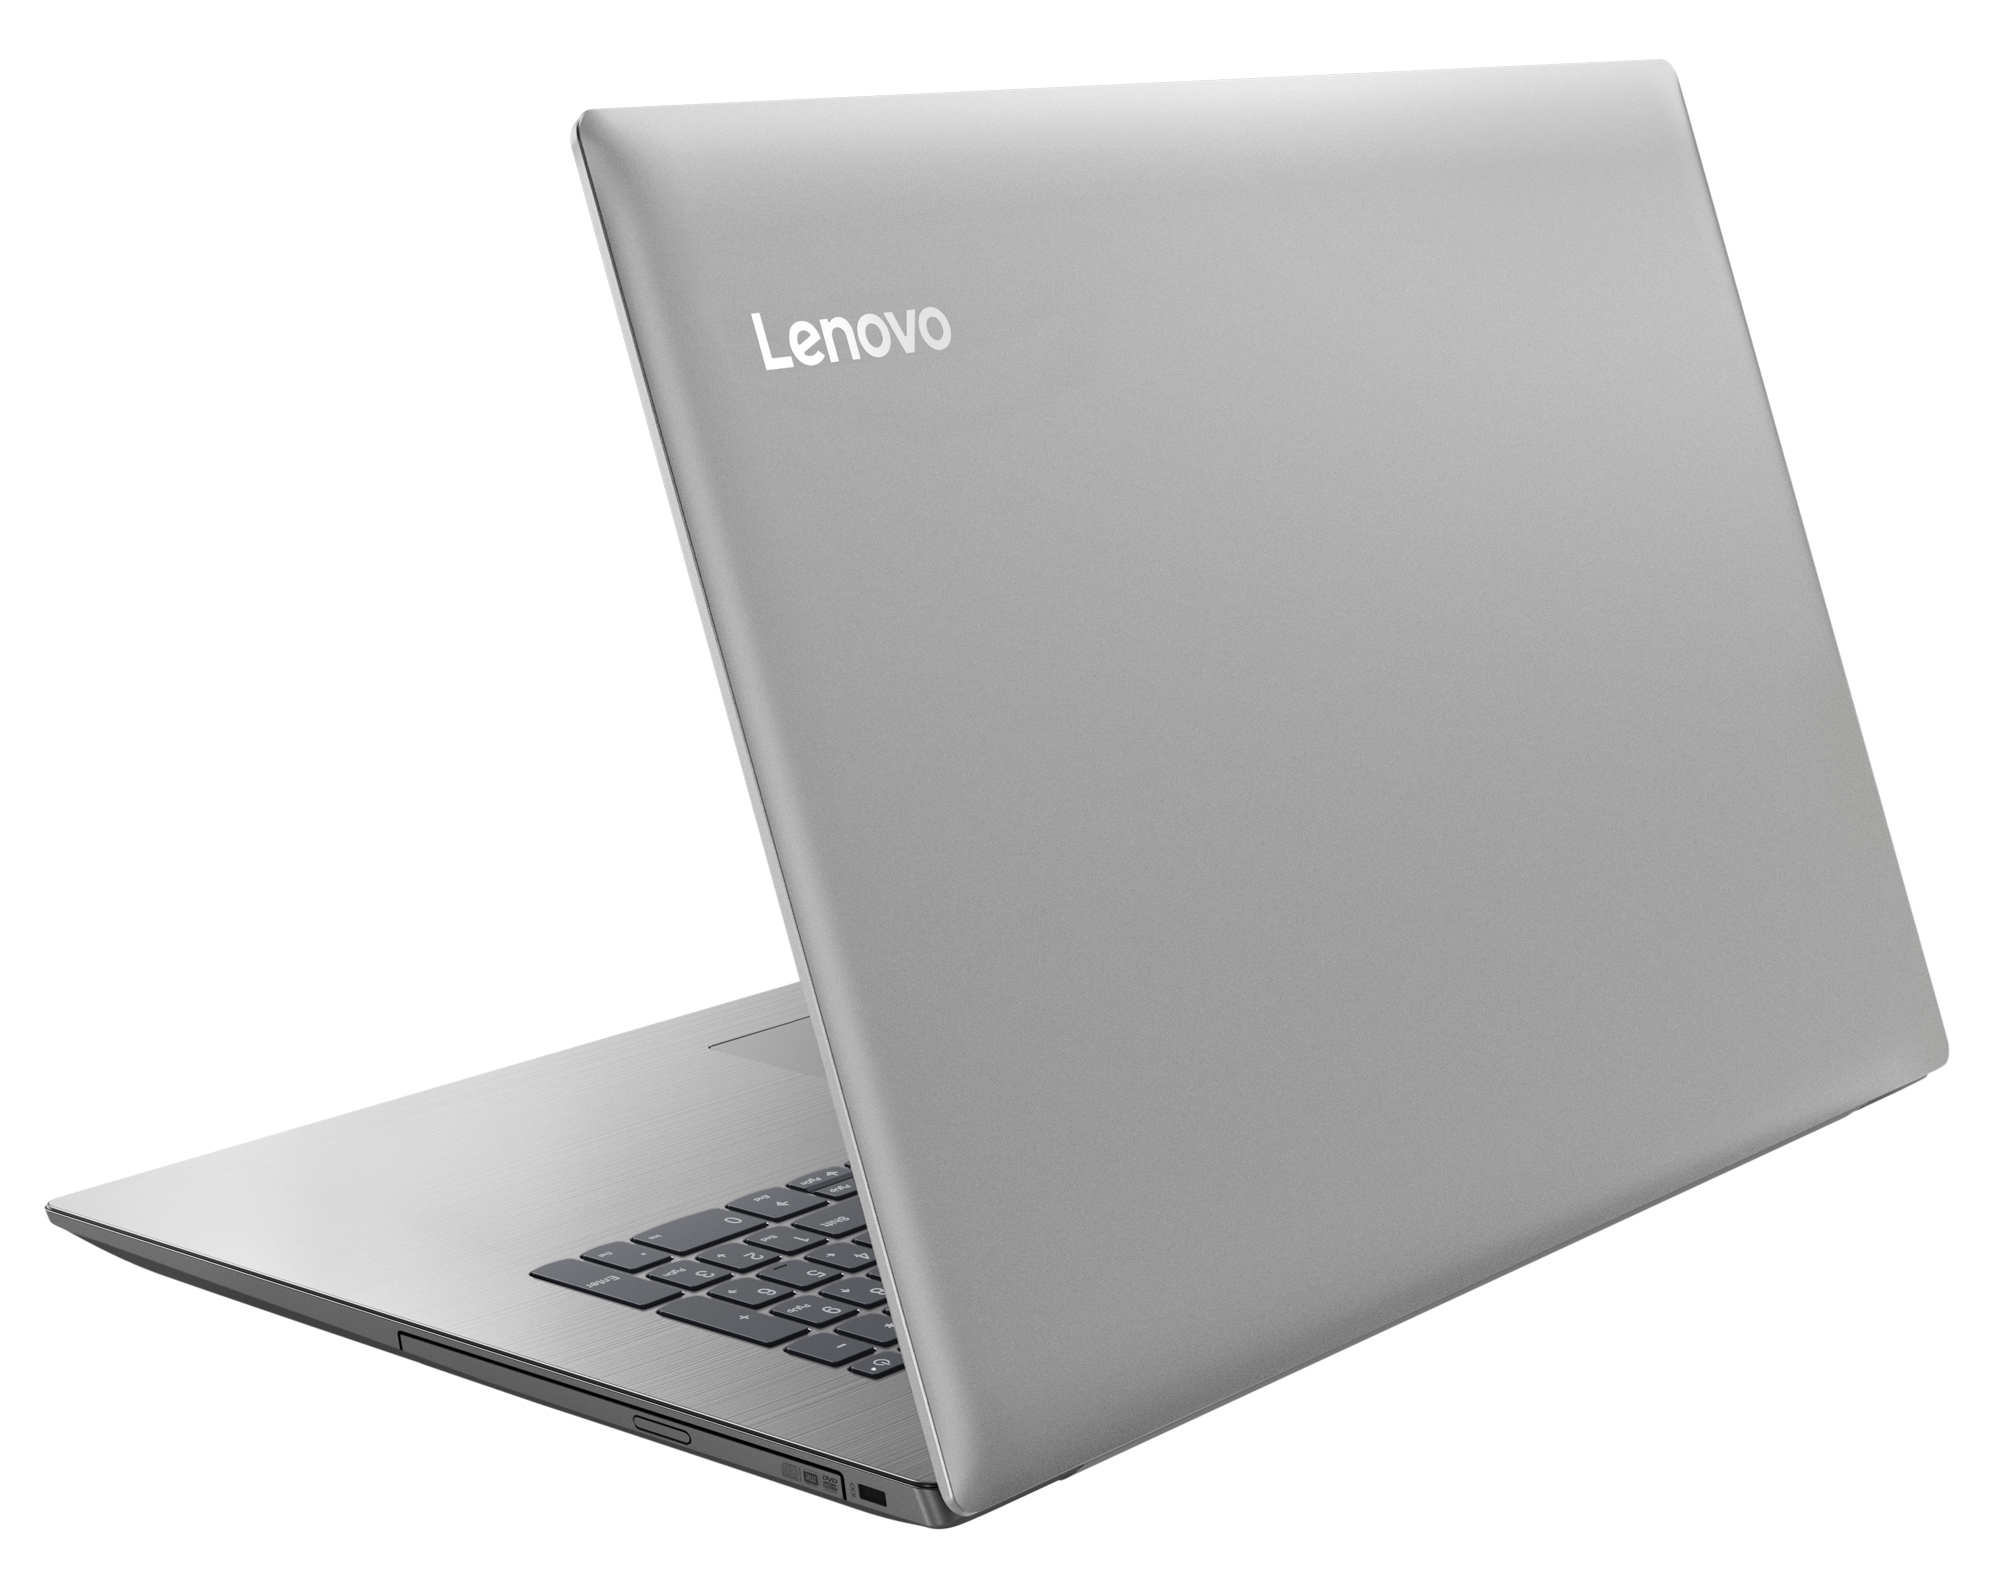 Фото  Ноутбук Lenovo ideapad 330-17IKBR Platinum Grey (81DM00EVRA)